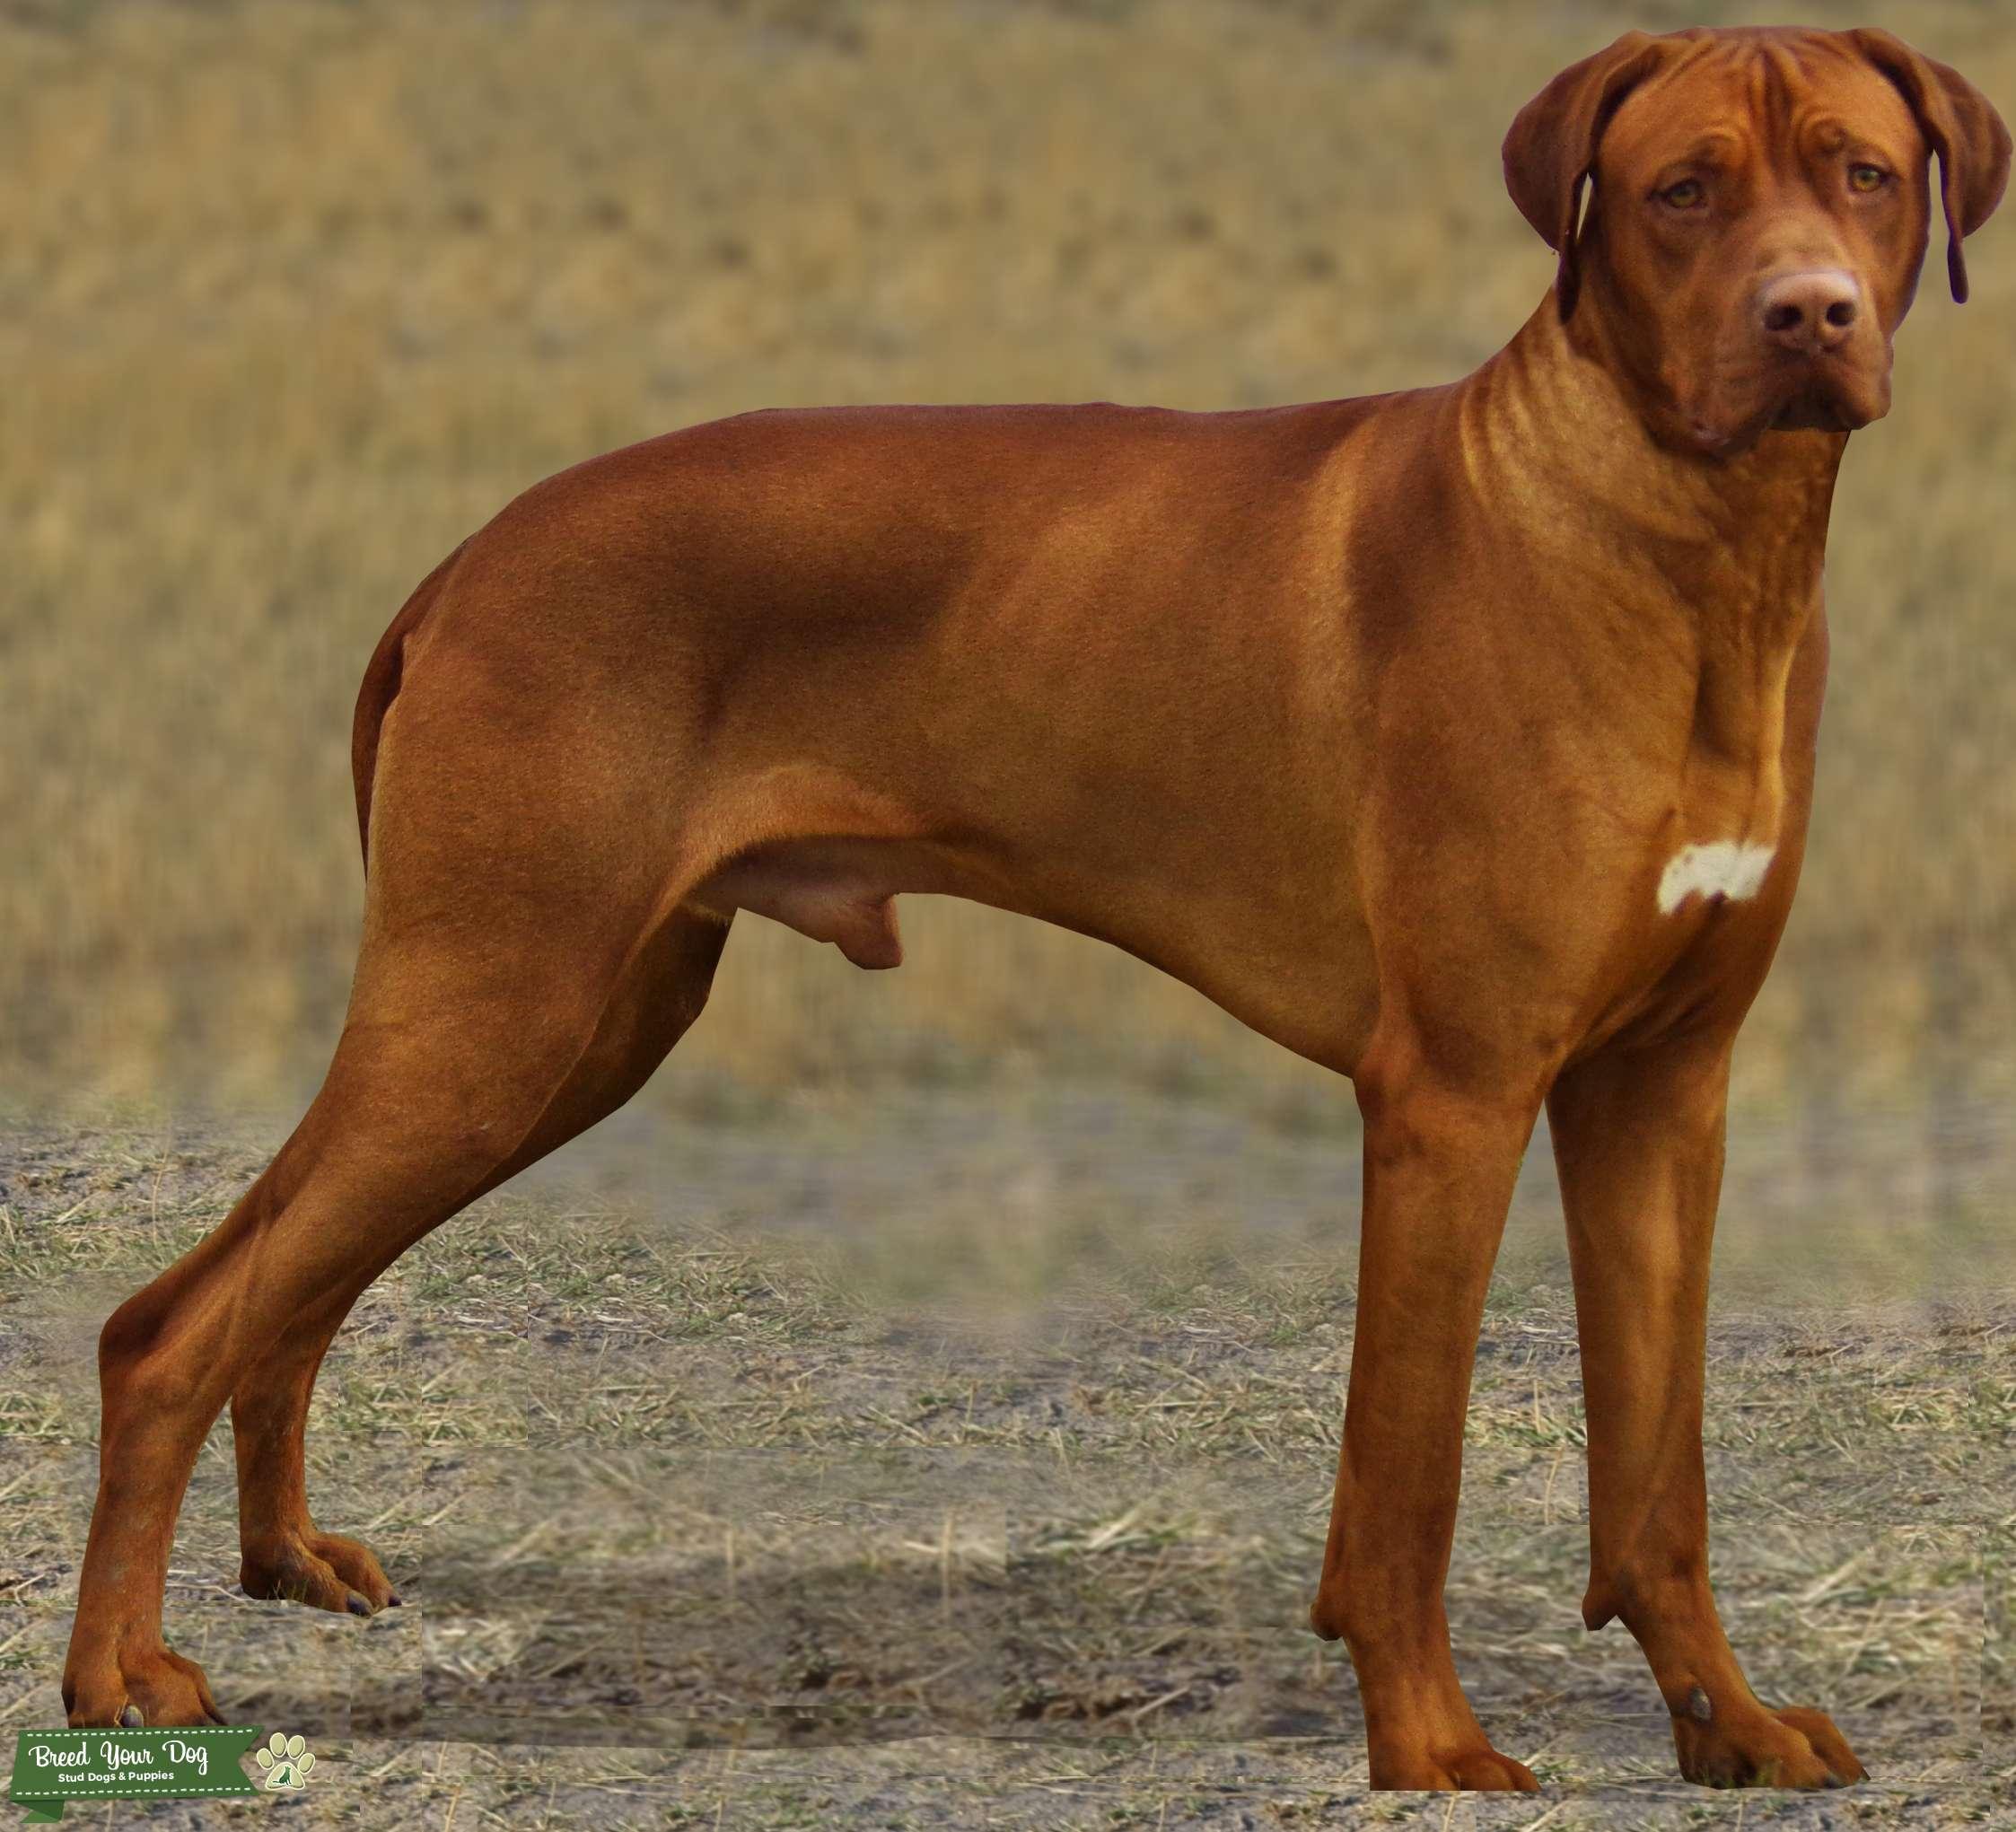 Rhodesian Ridgeback Livernose Stud Dog Listing Image Big